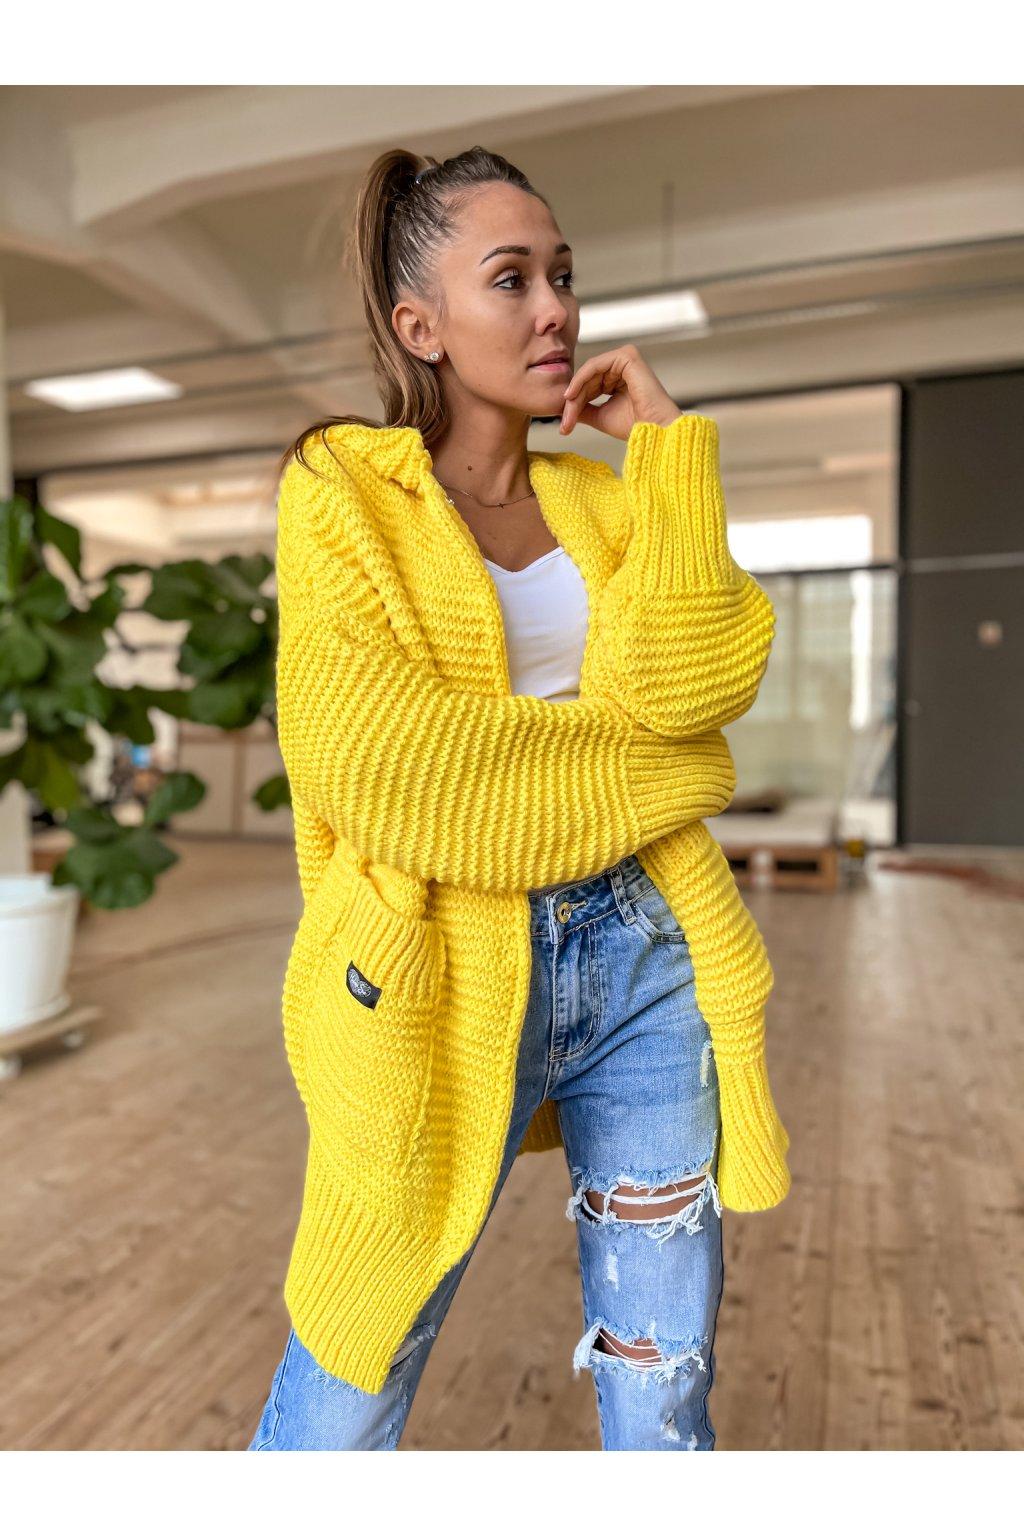 damsky cardigan maxi yellow eshopat cz 1